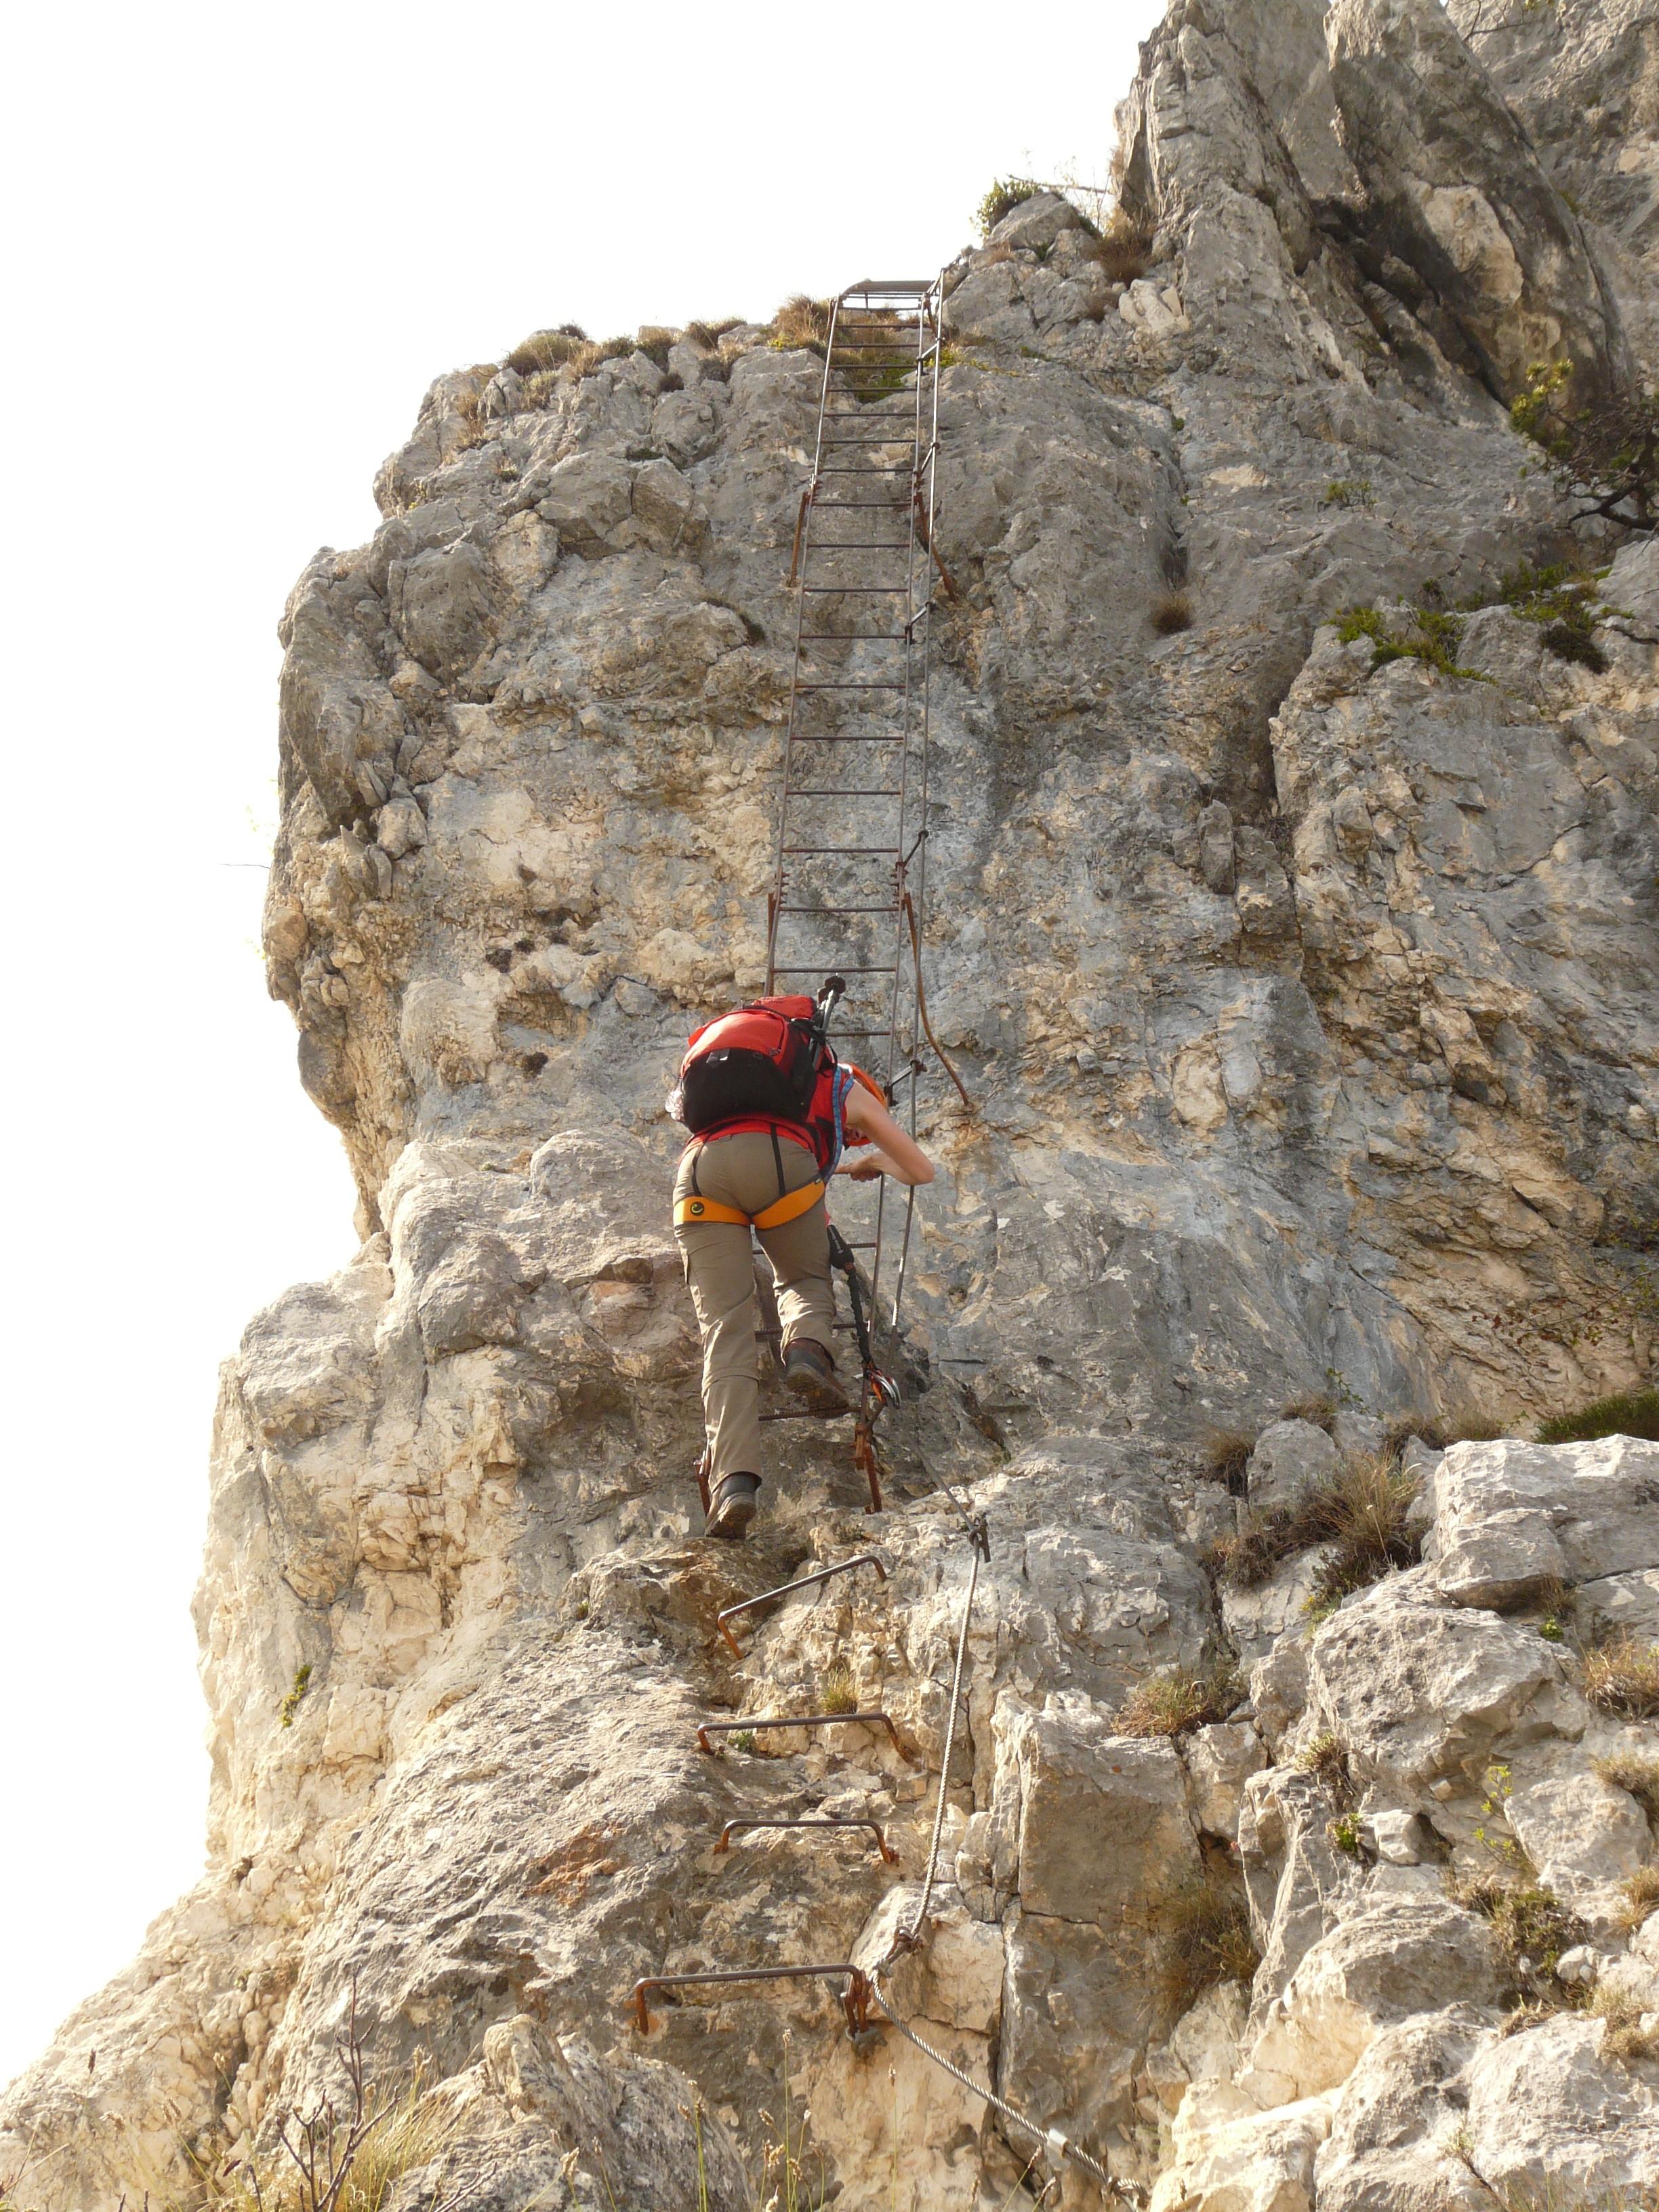 Kostenlose foto : Rock, Wandern, Abenteuer, eng, Bildung, Cliff ...